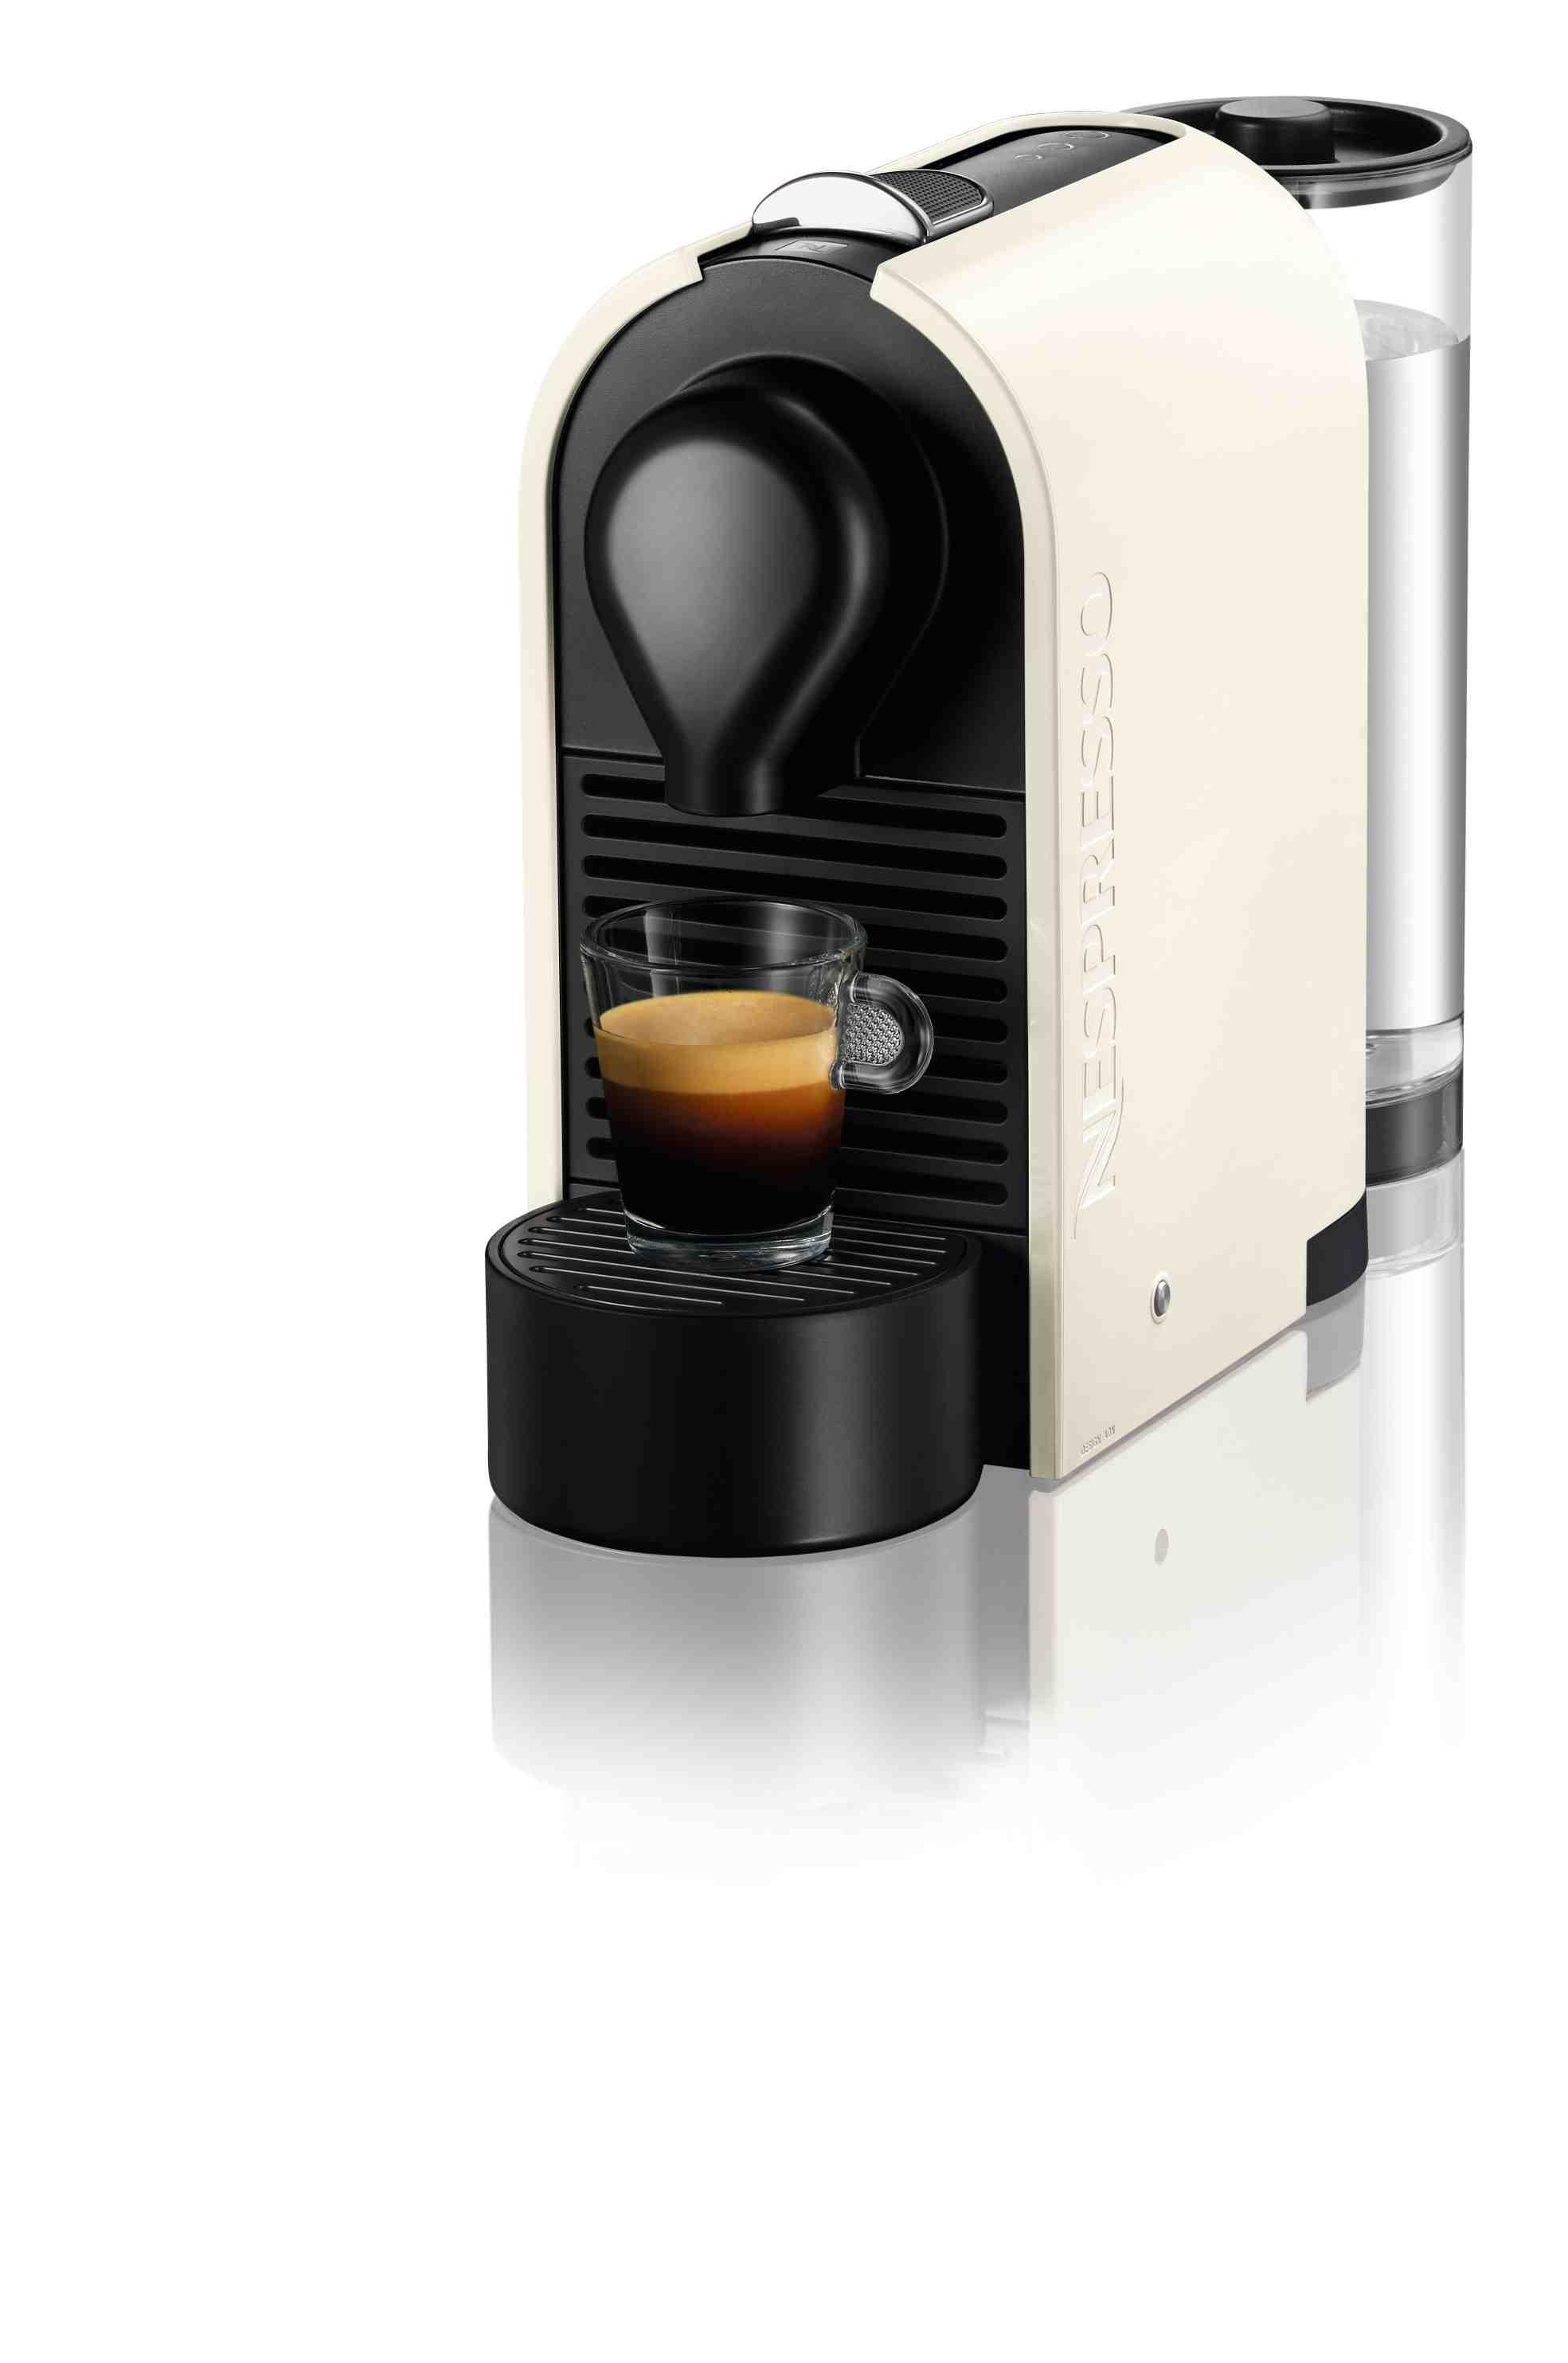 new entry level nespresso machine. Black Bedroom Furniture Sets. Home Design Ideas